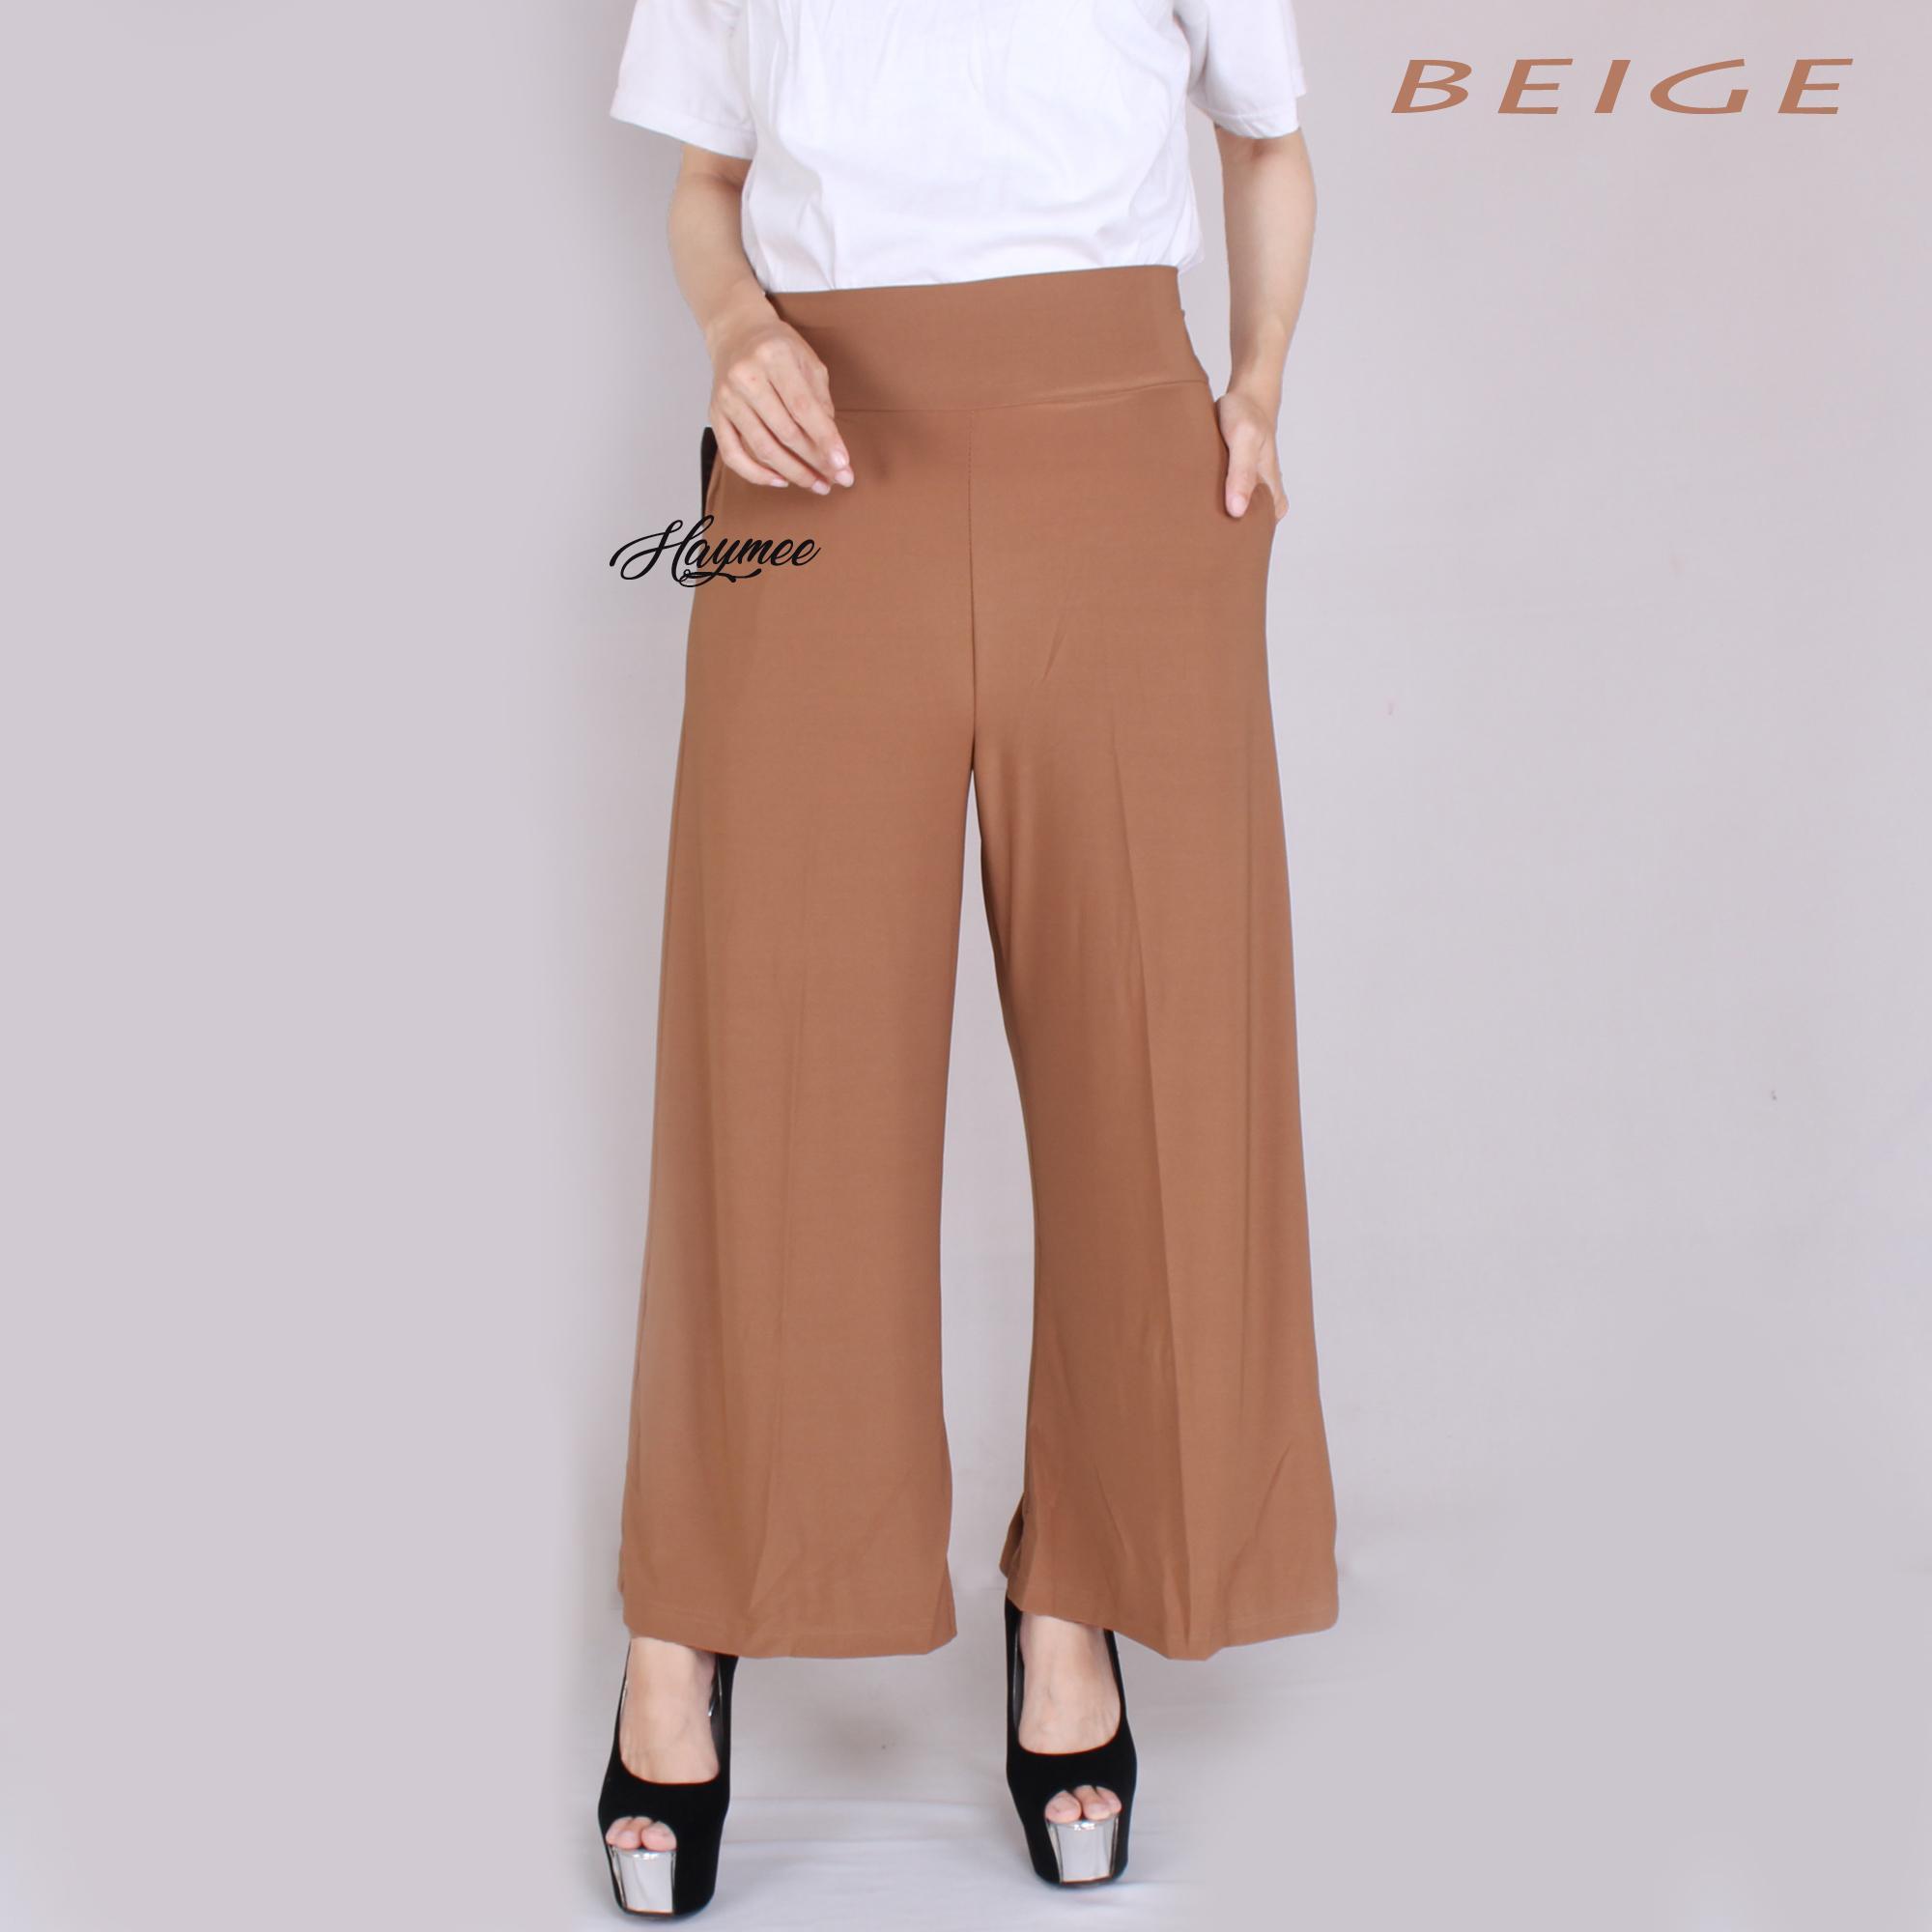 HaymeeStore Celana Kulot Jersey Panjang  Wanita Celana Cullot Jersey Import Wanita Kantor Casual Fashion